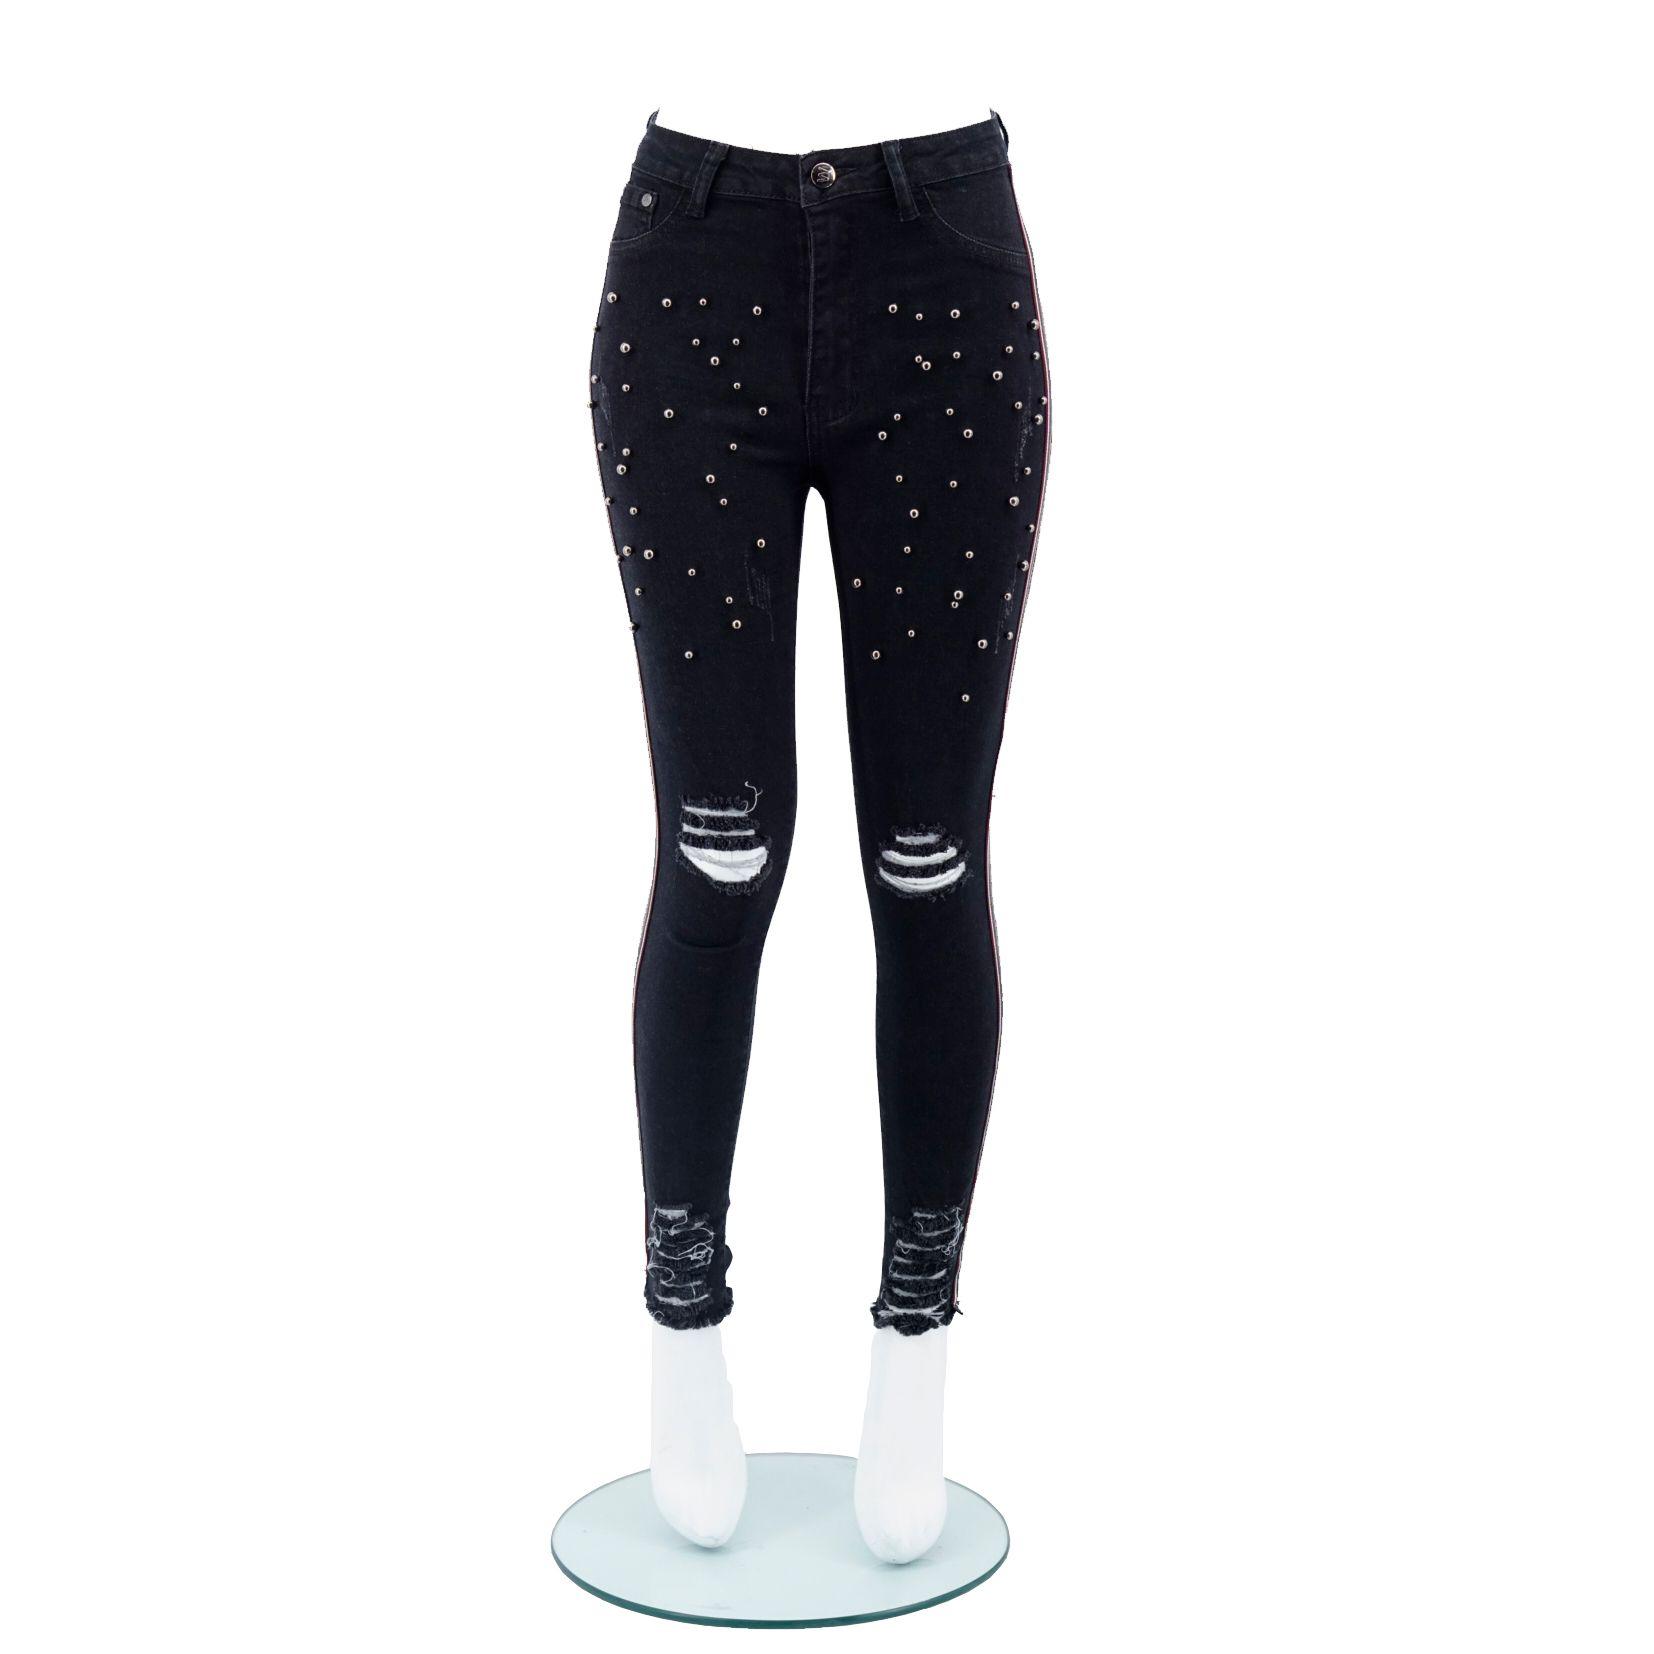 c0d35cf235f8 Women Sexy High Waist Skinny Stretch Jeans Denim Pants Fashion Popular Slim  Fit Elasticity Lift Hip Light Wash,Navy Blue,Pearl Hole Pants